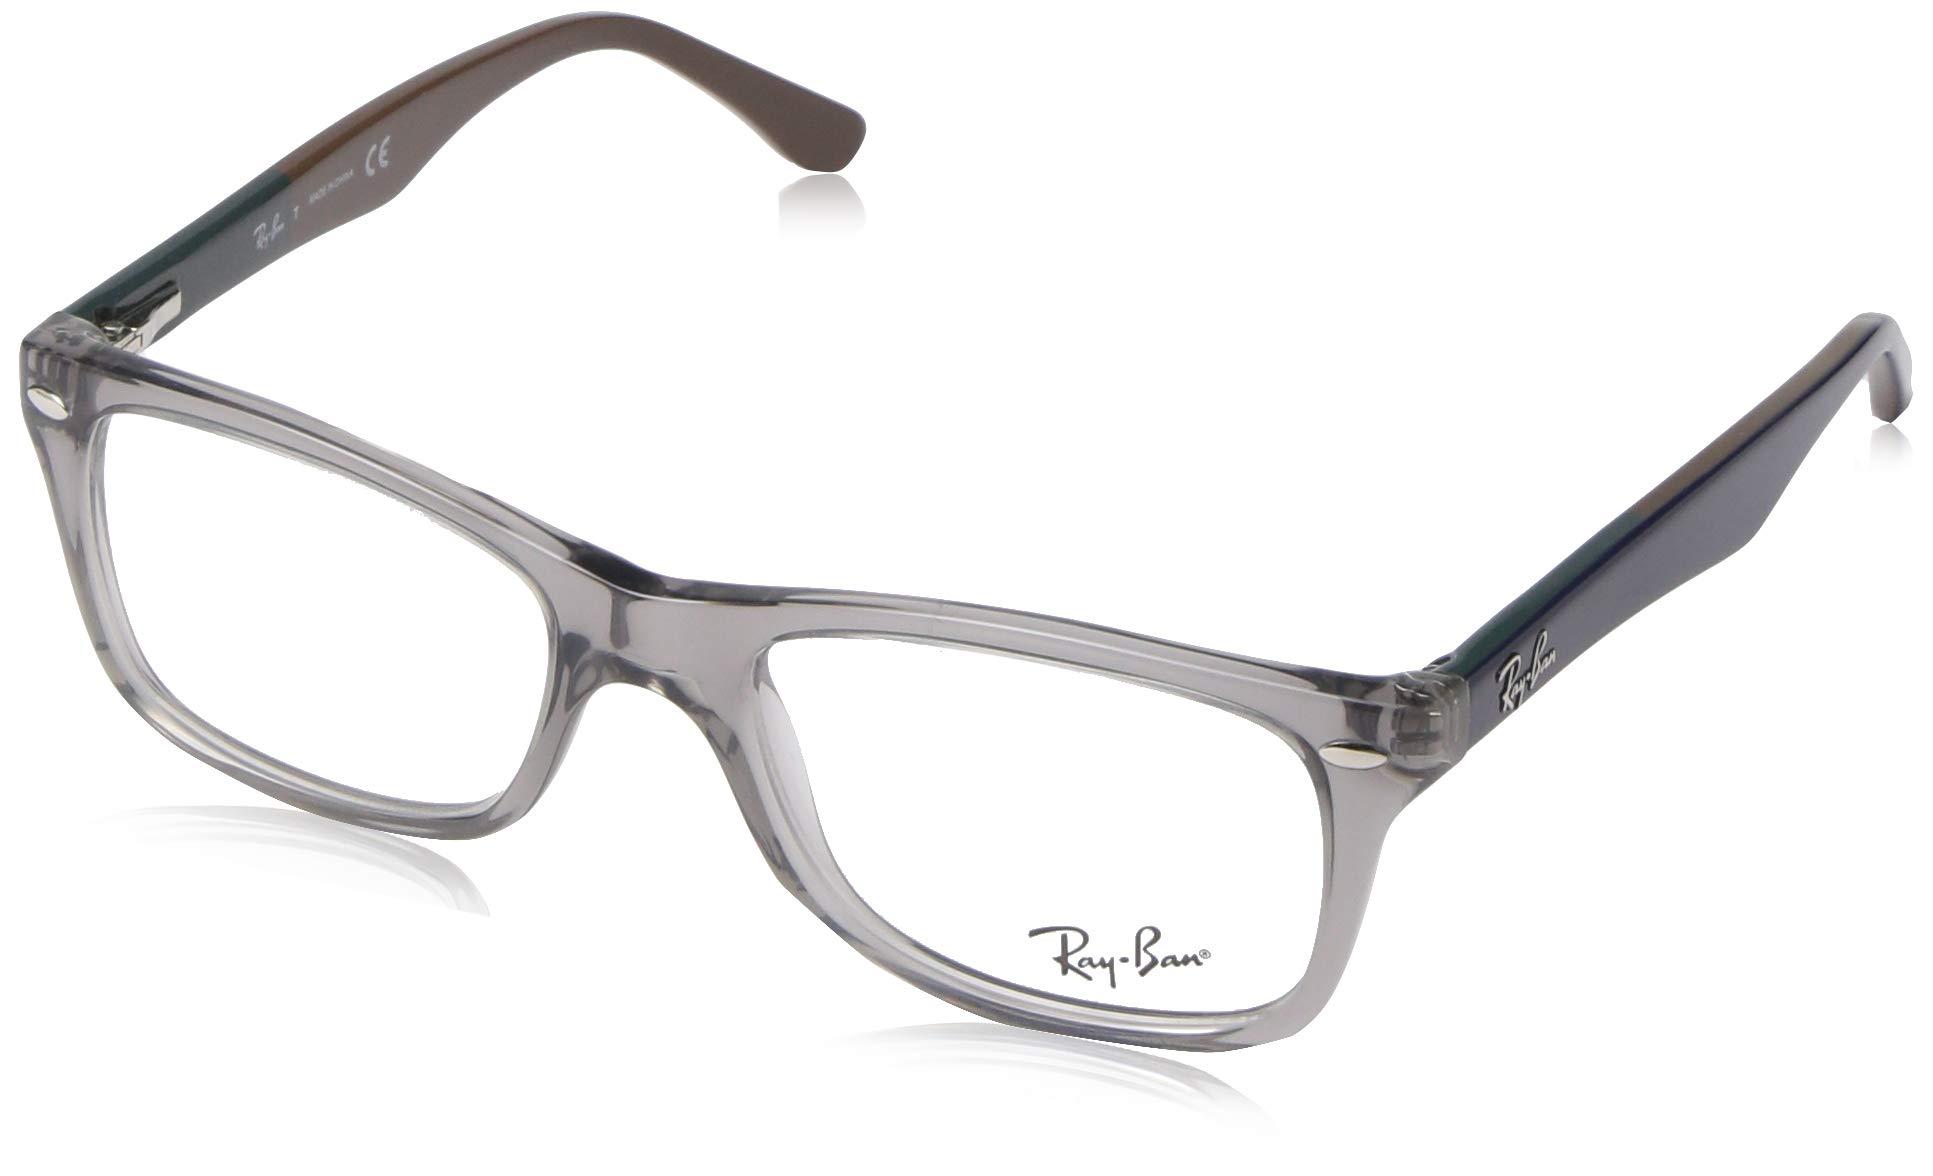 Ray-Ban RX5228 Square Eyeglass Frames, Grey/Demo Lens, 55 mm by Ray-Ban